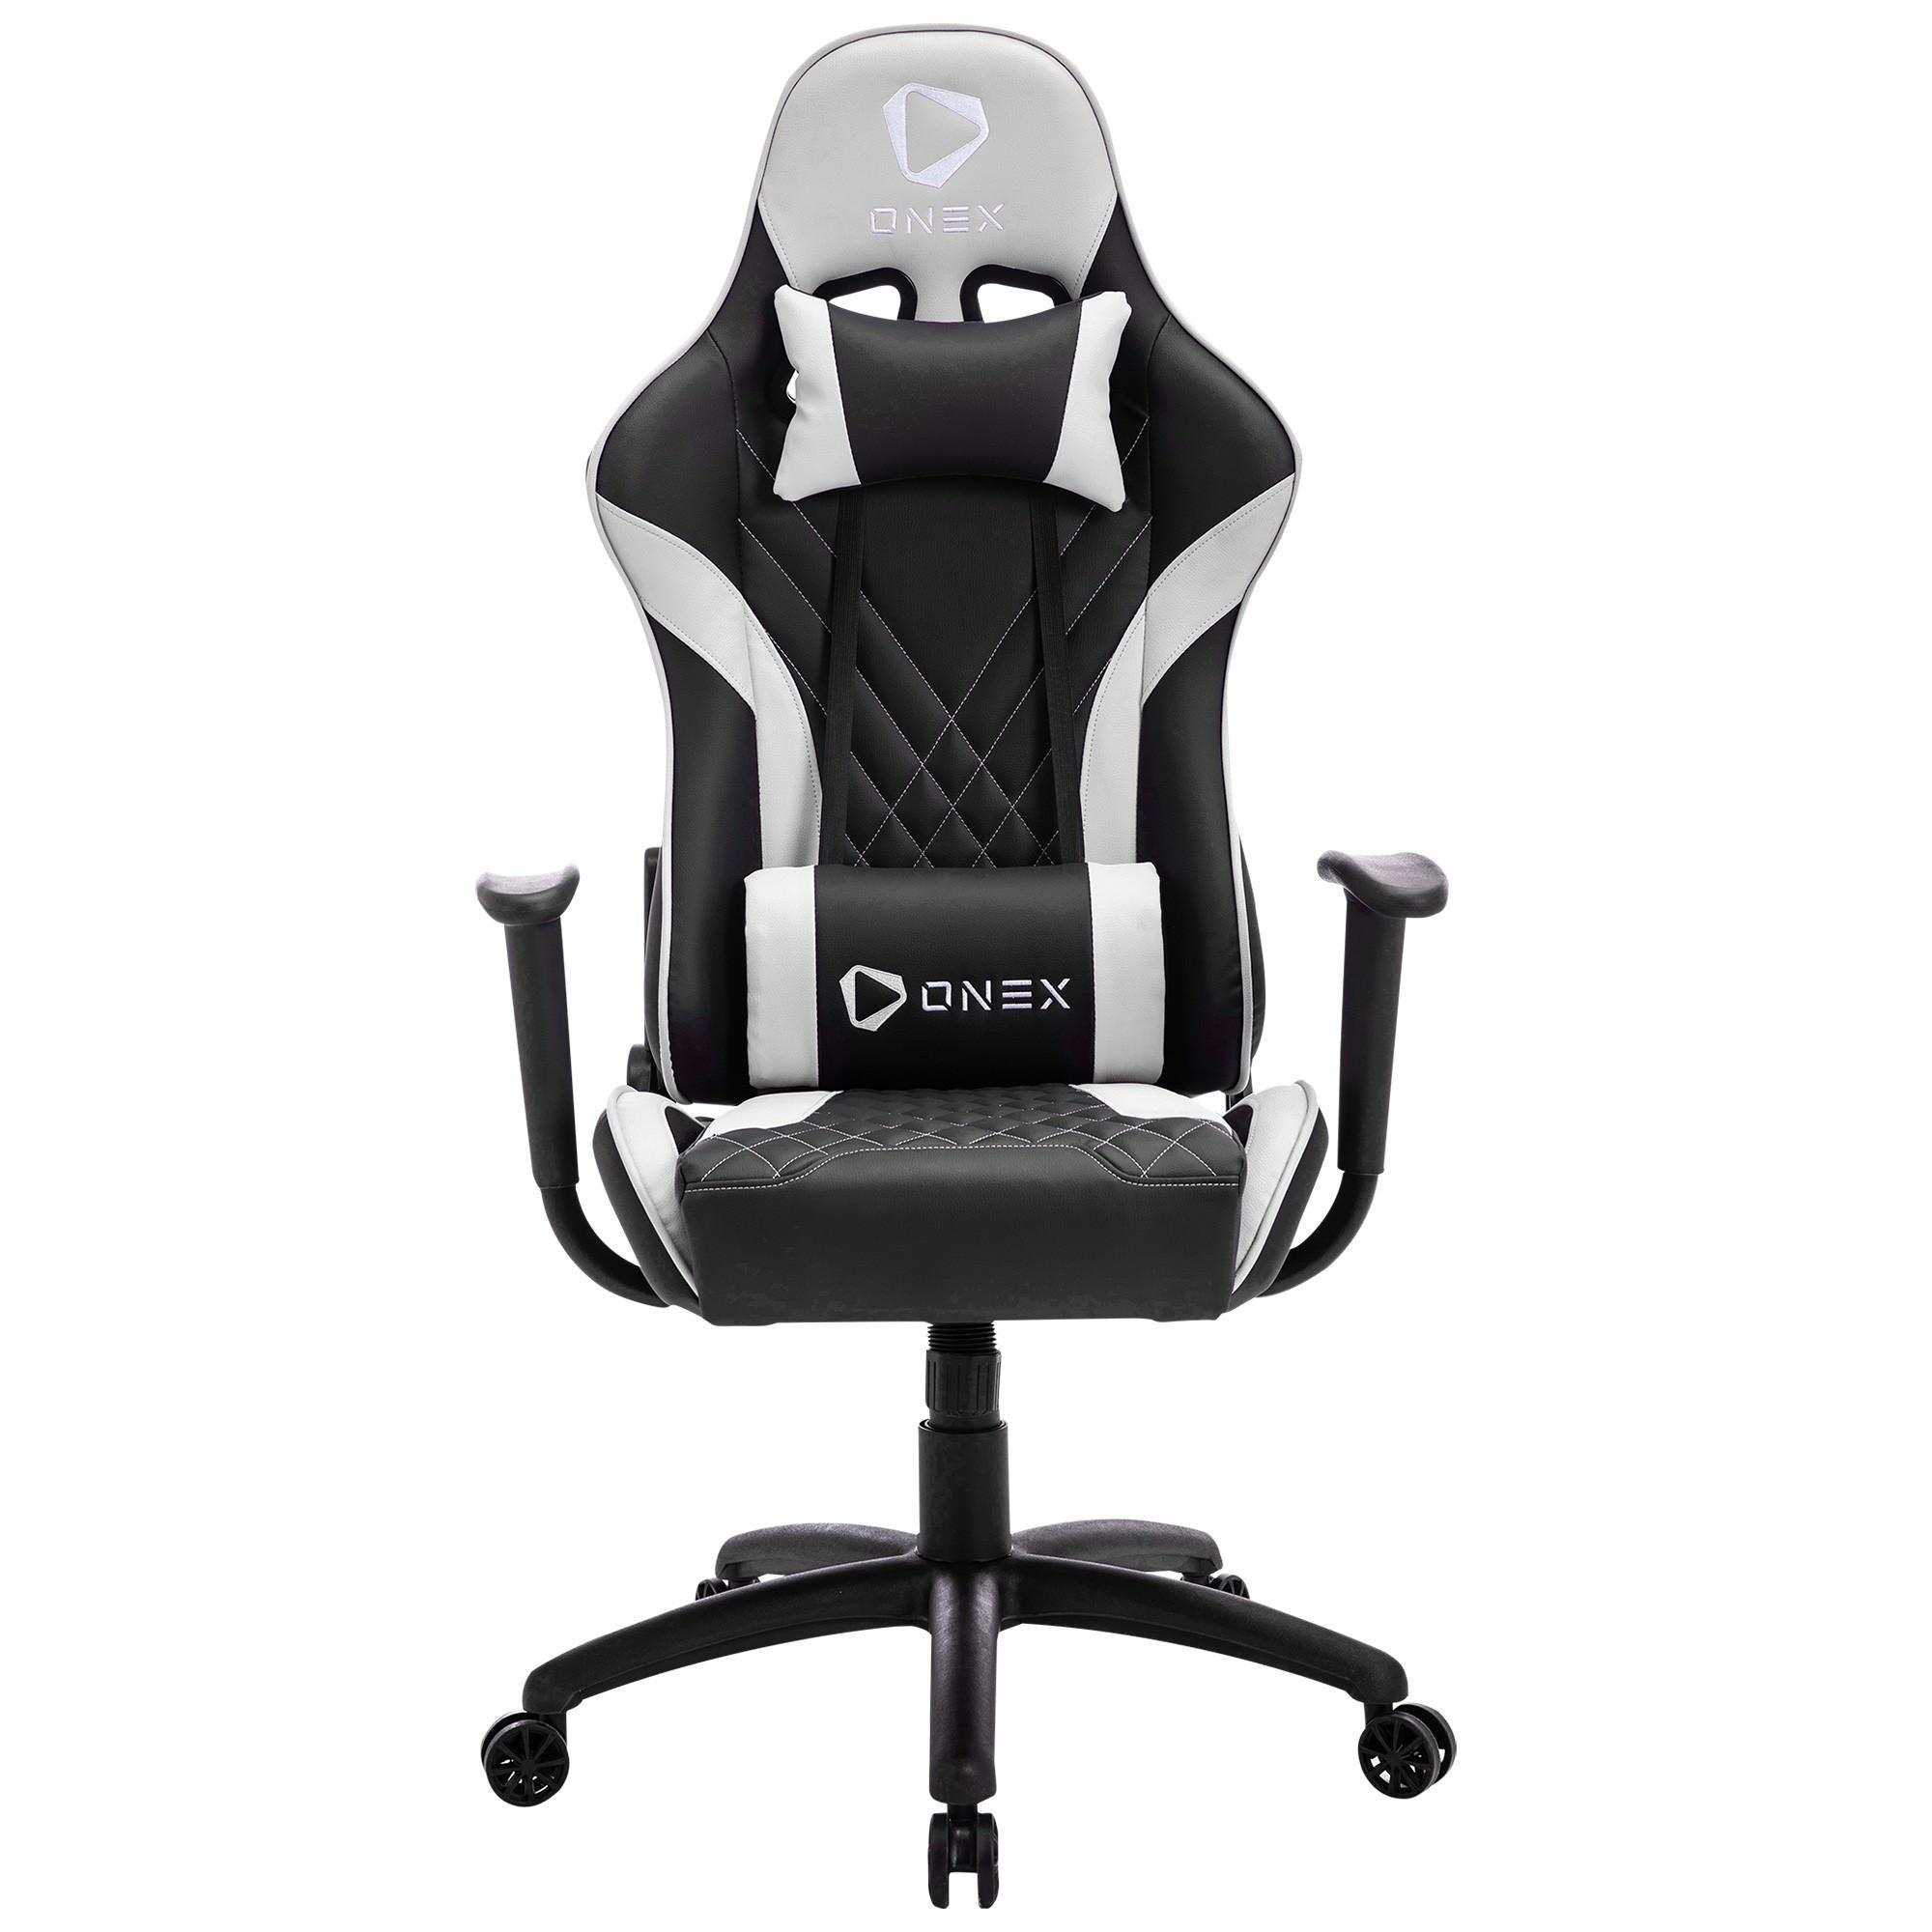 ONEX GX2 Gaming Chair, Black / White